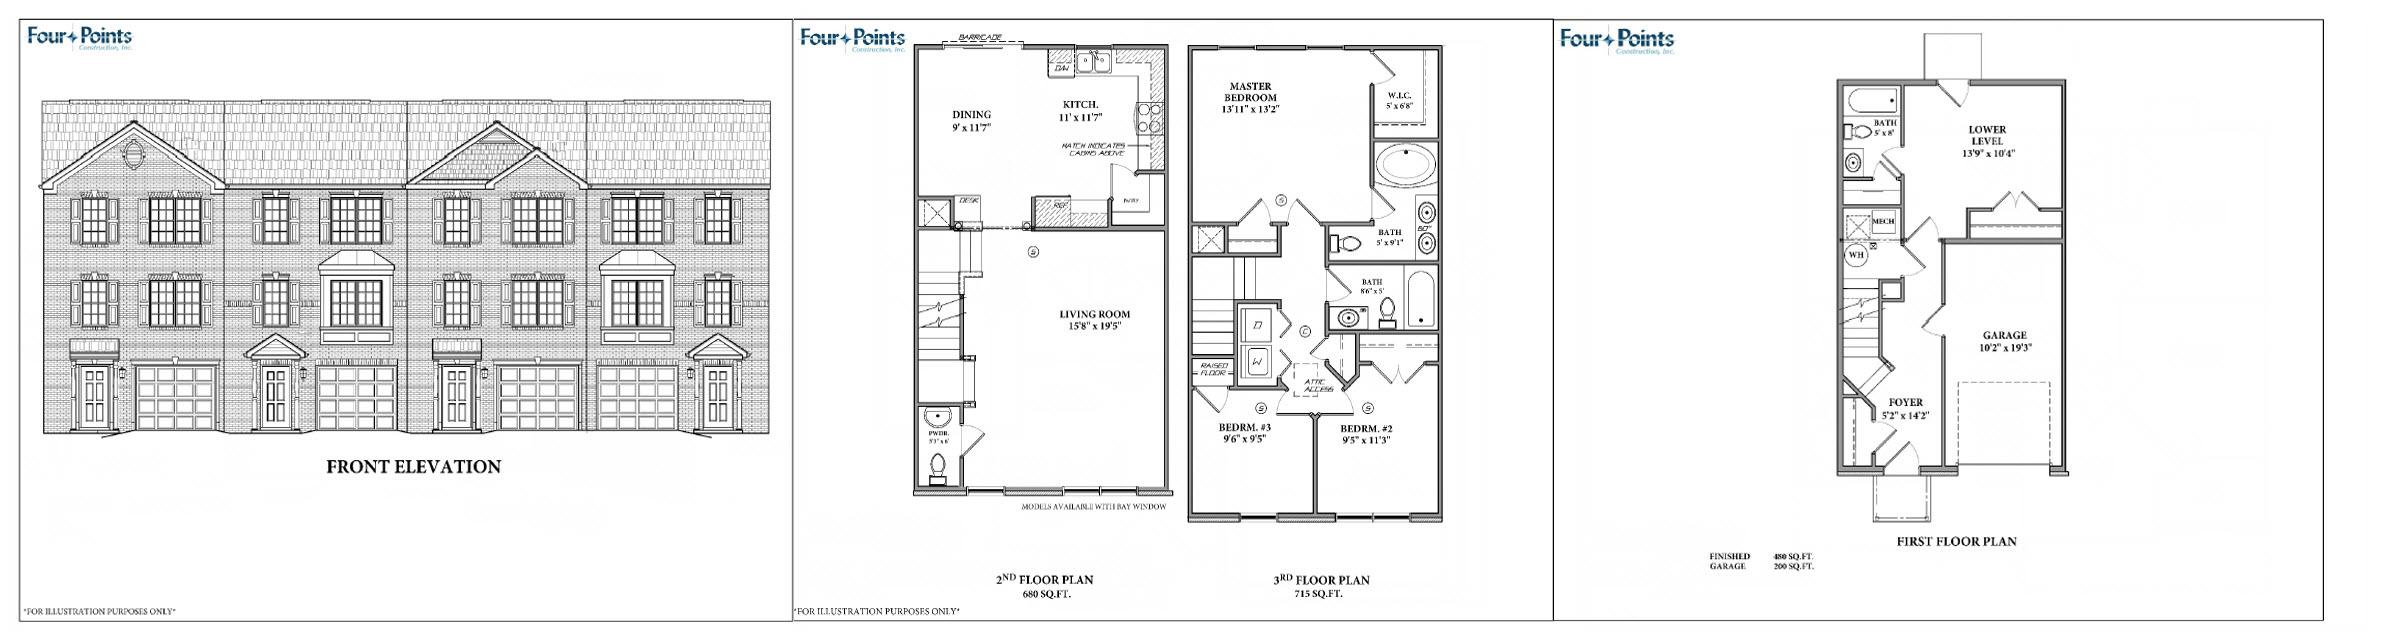 Models Four Points Construction Inc Martinsburg Wv